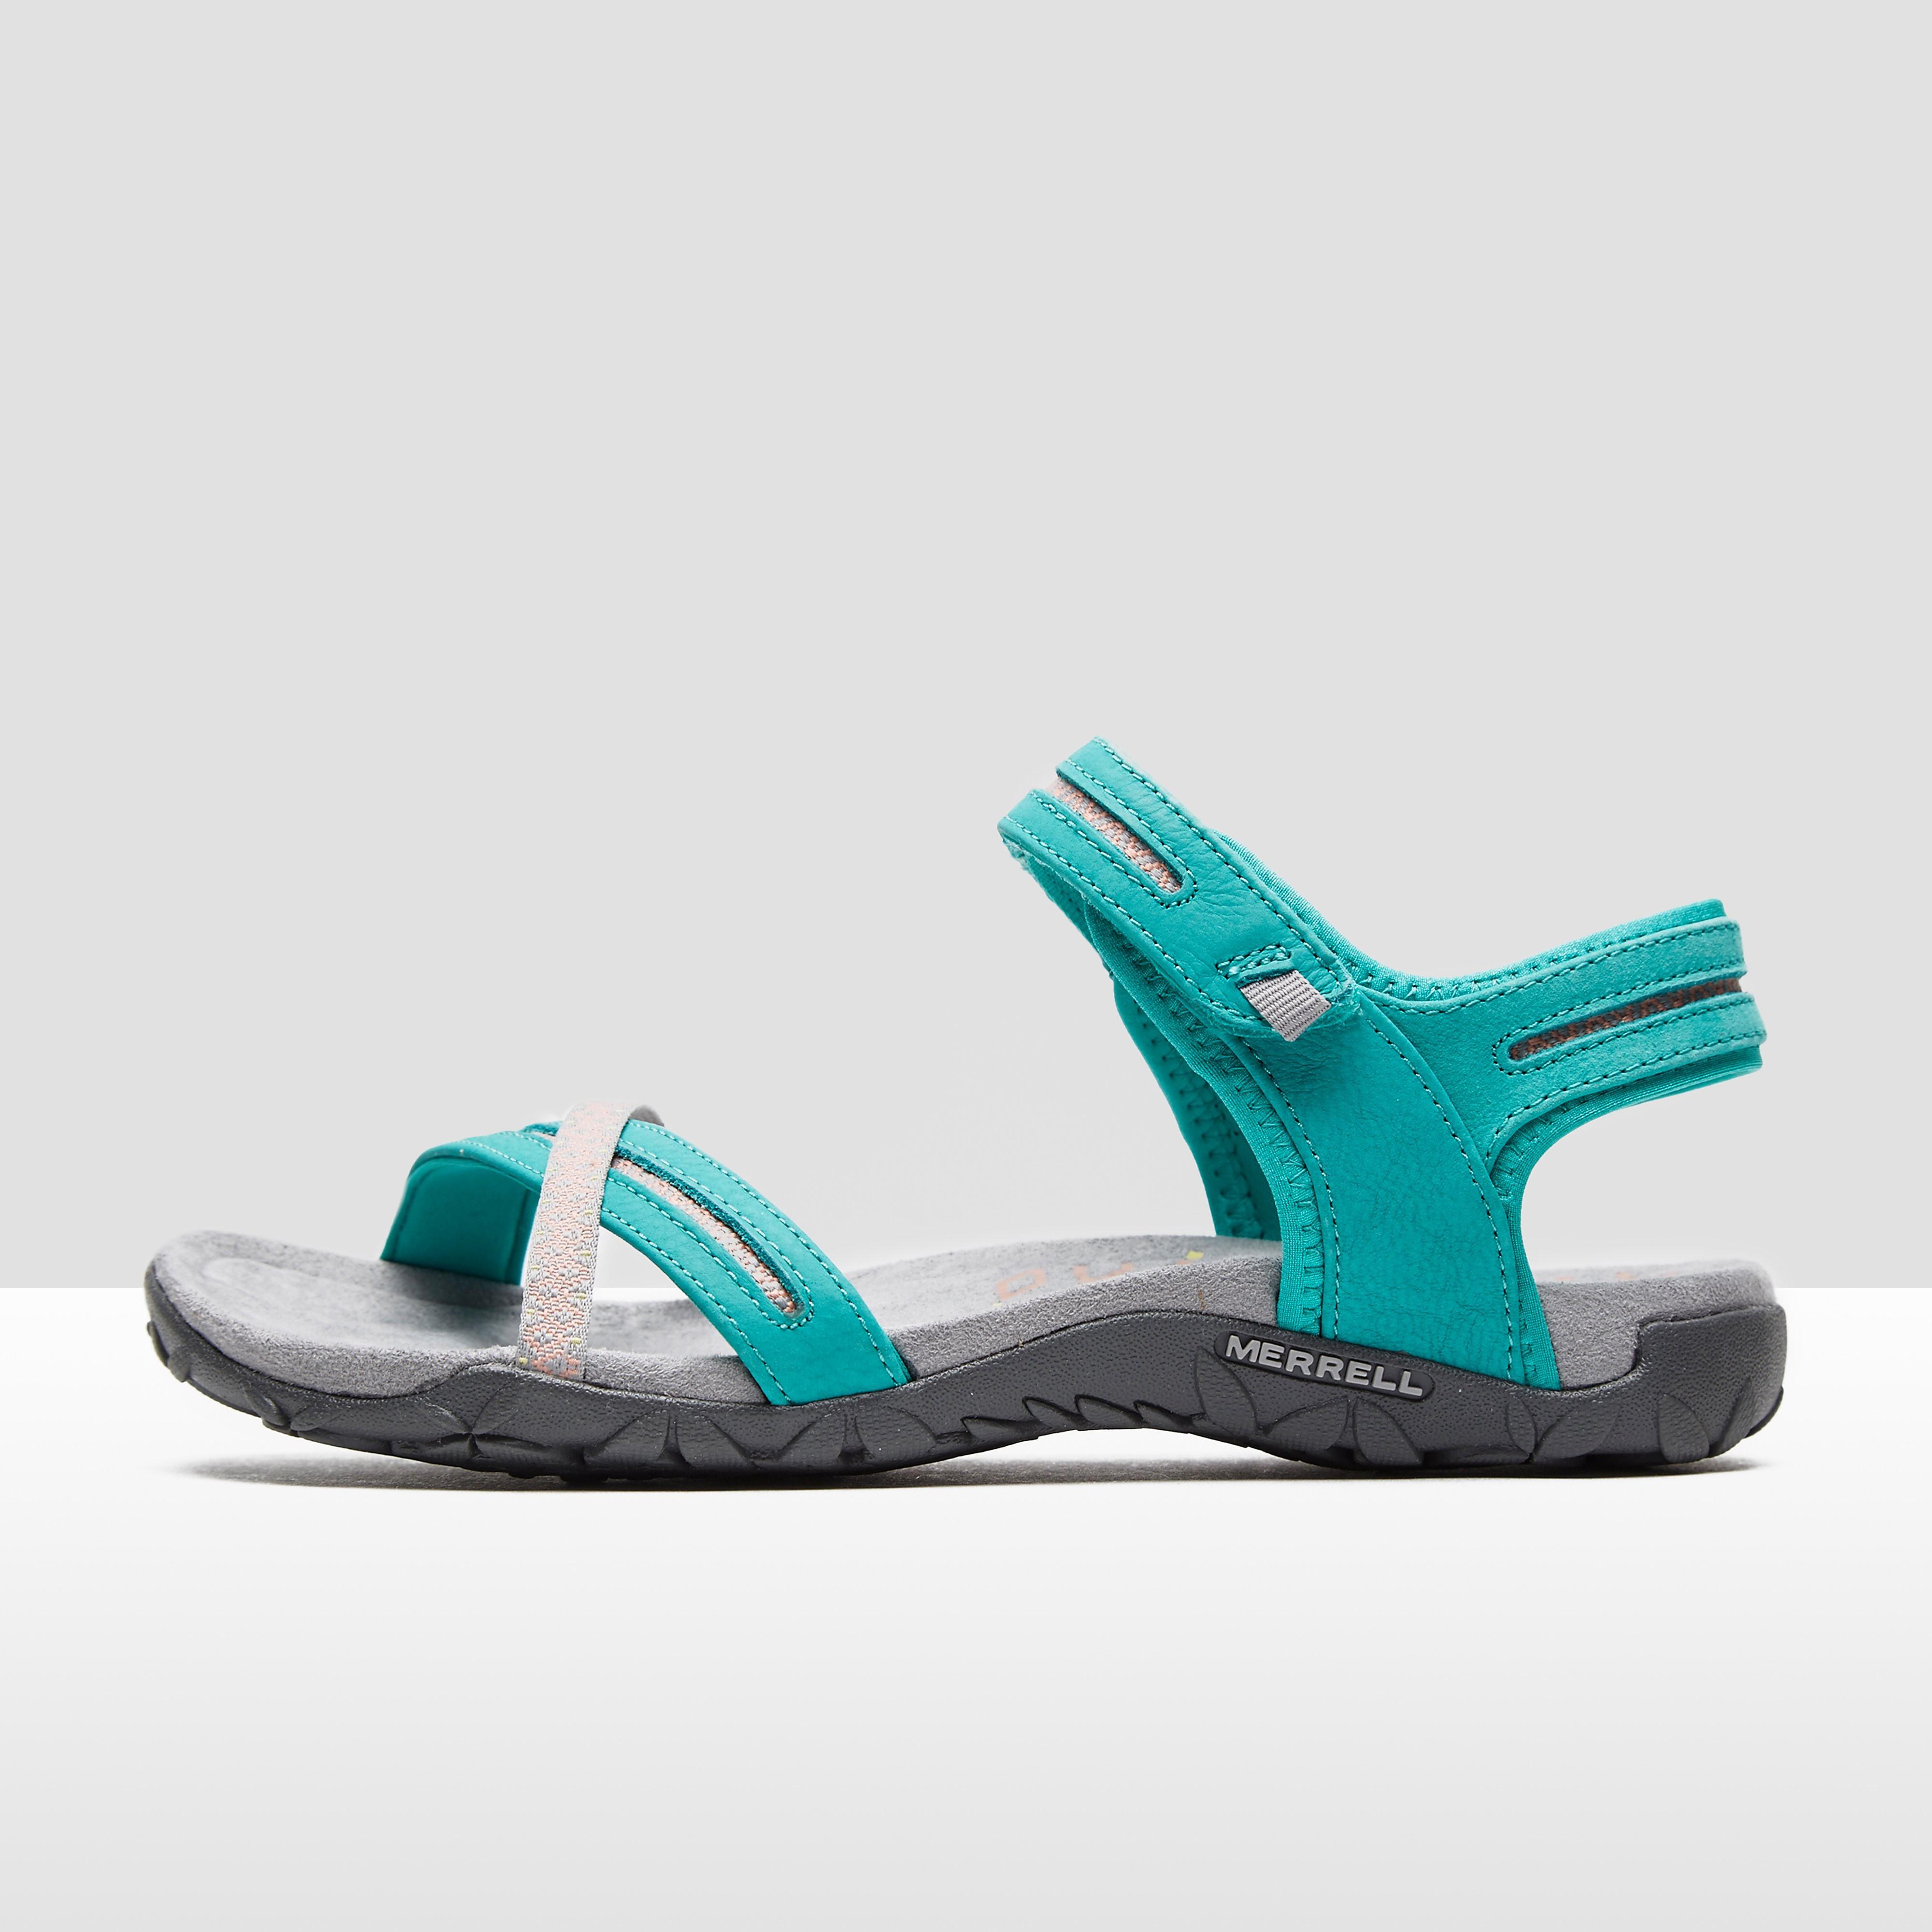 Merrell Terran Cross Women's Sandals